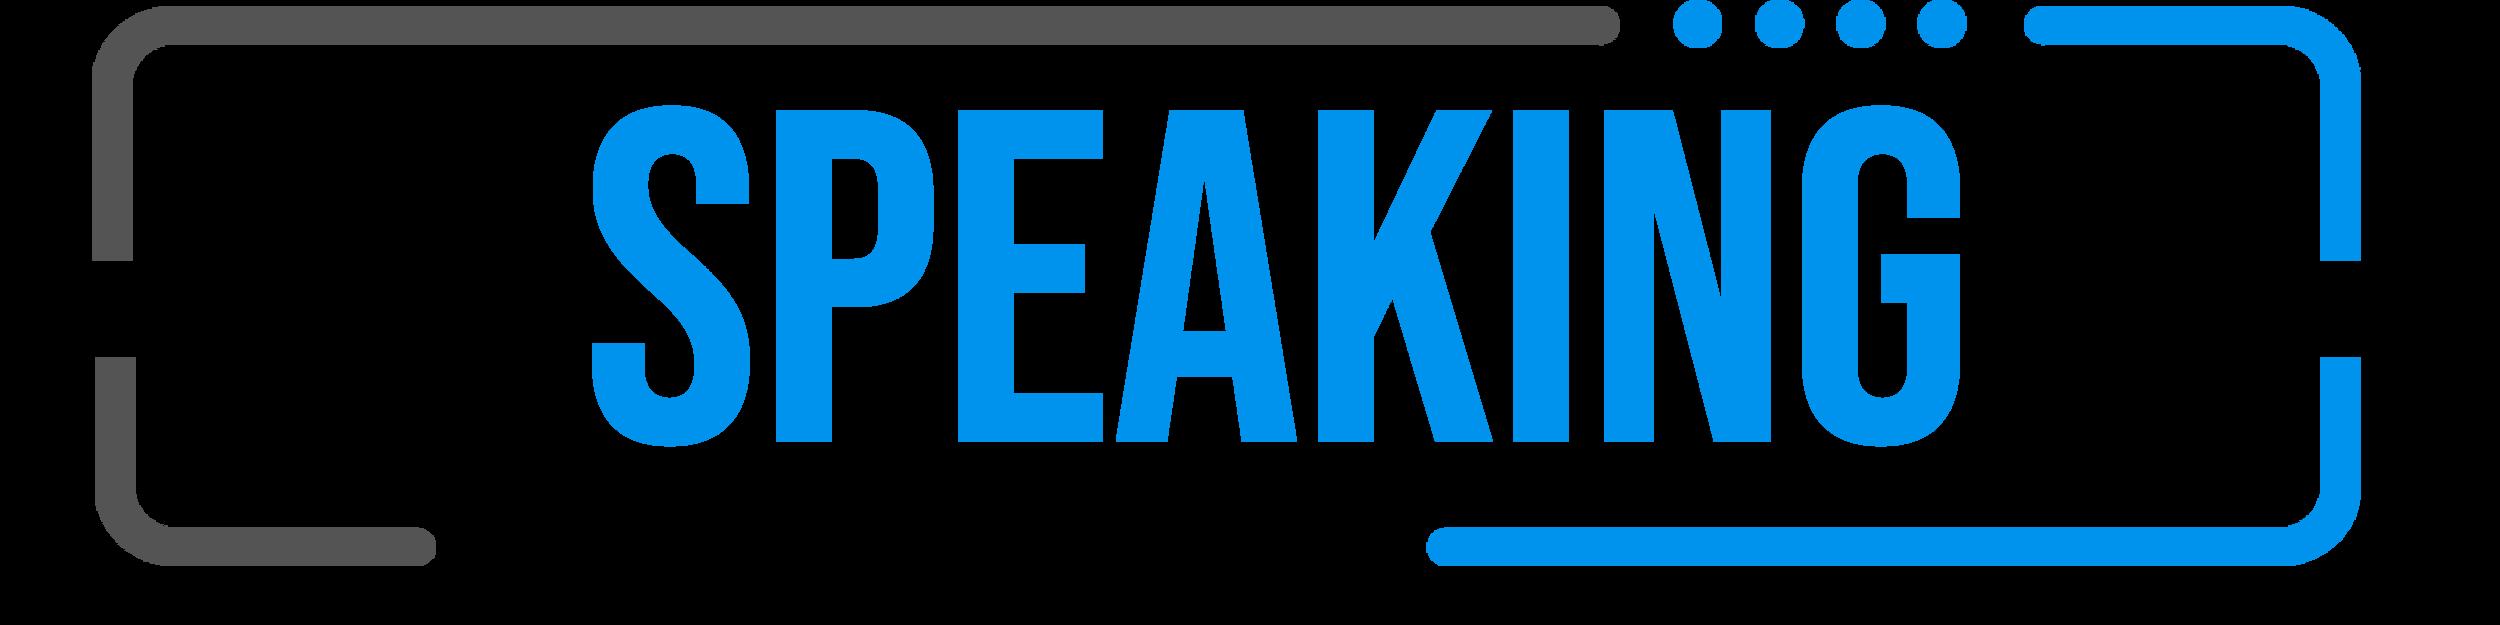 speakingtitle.png